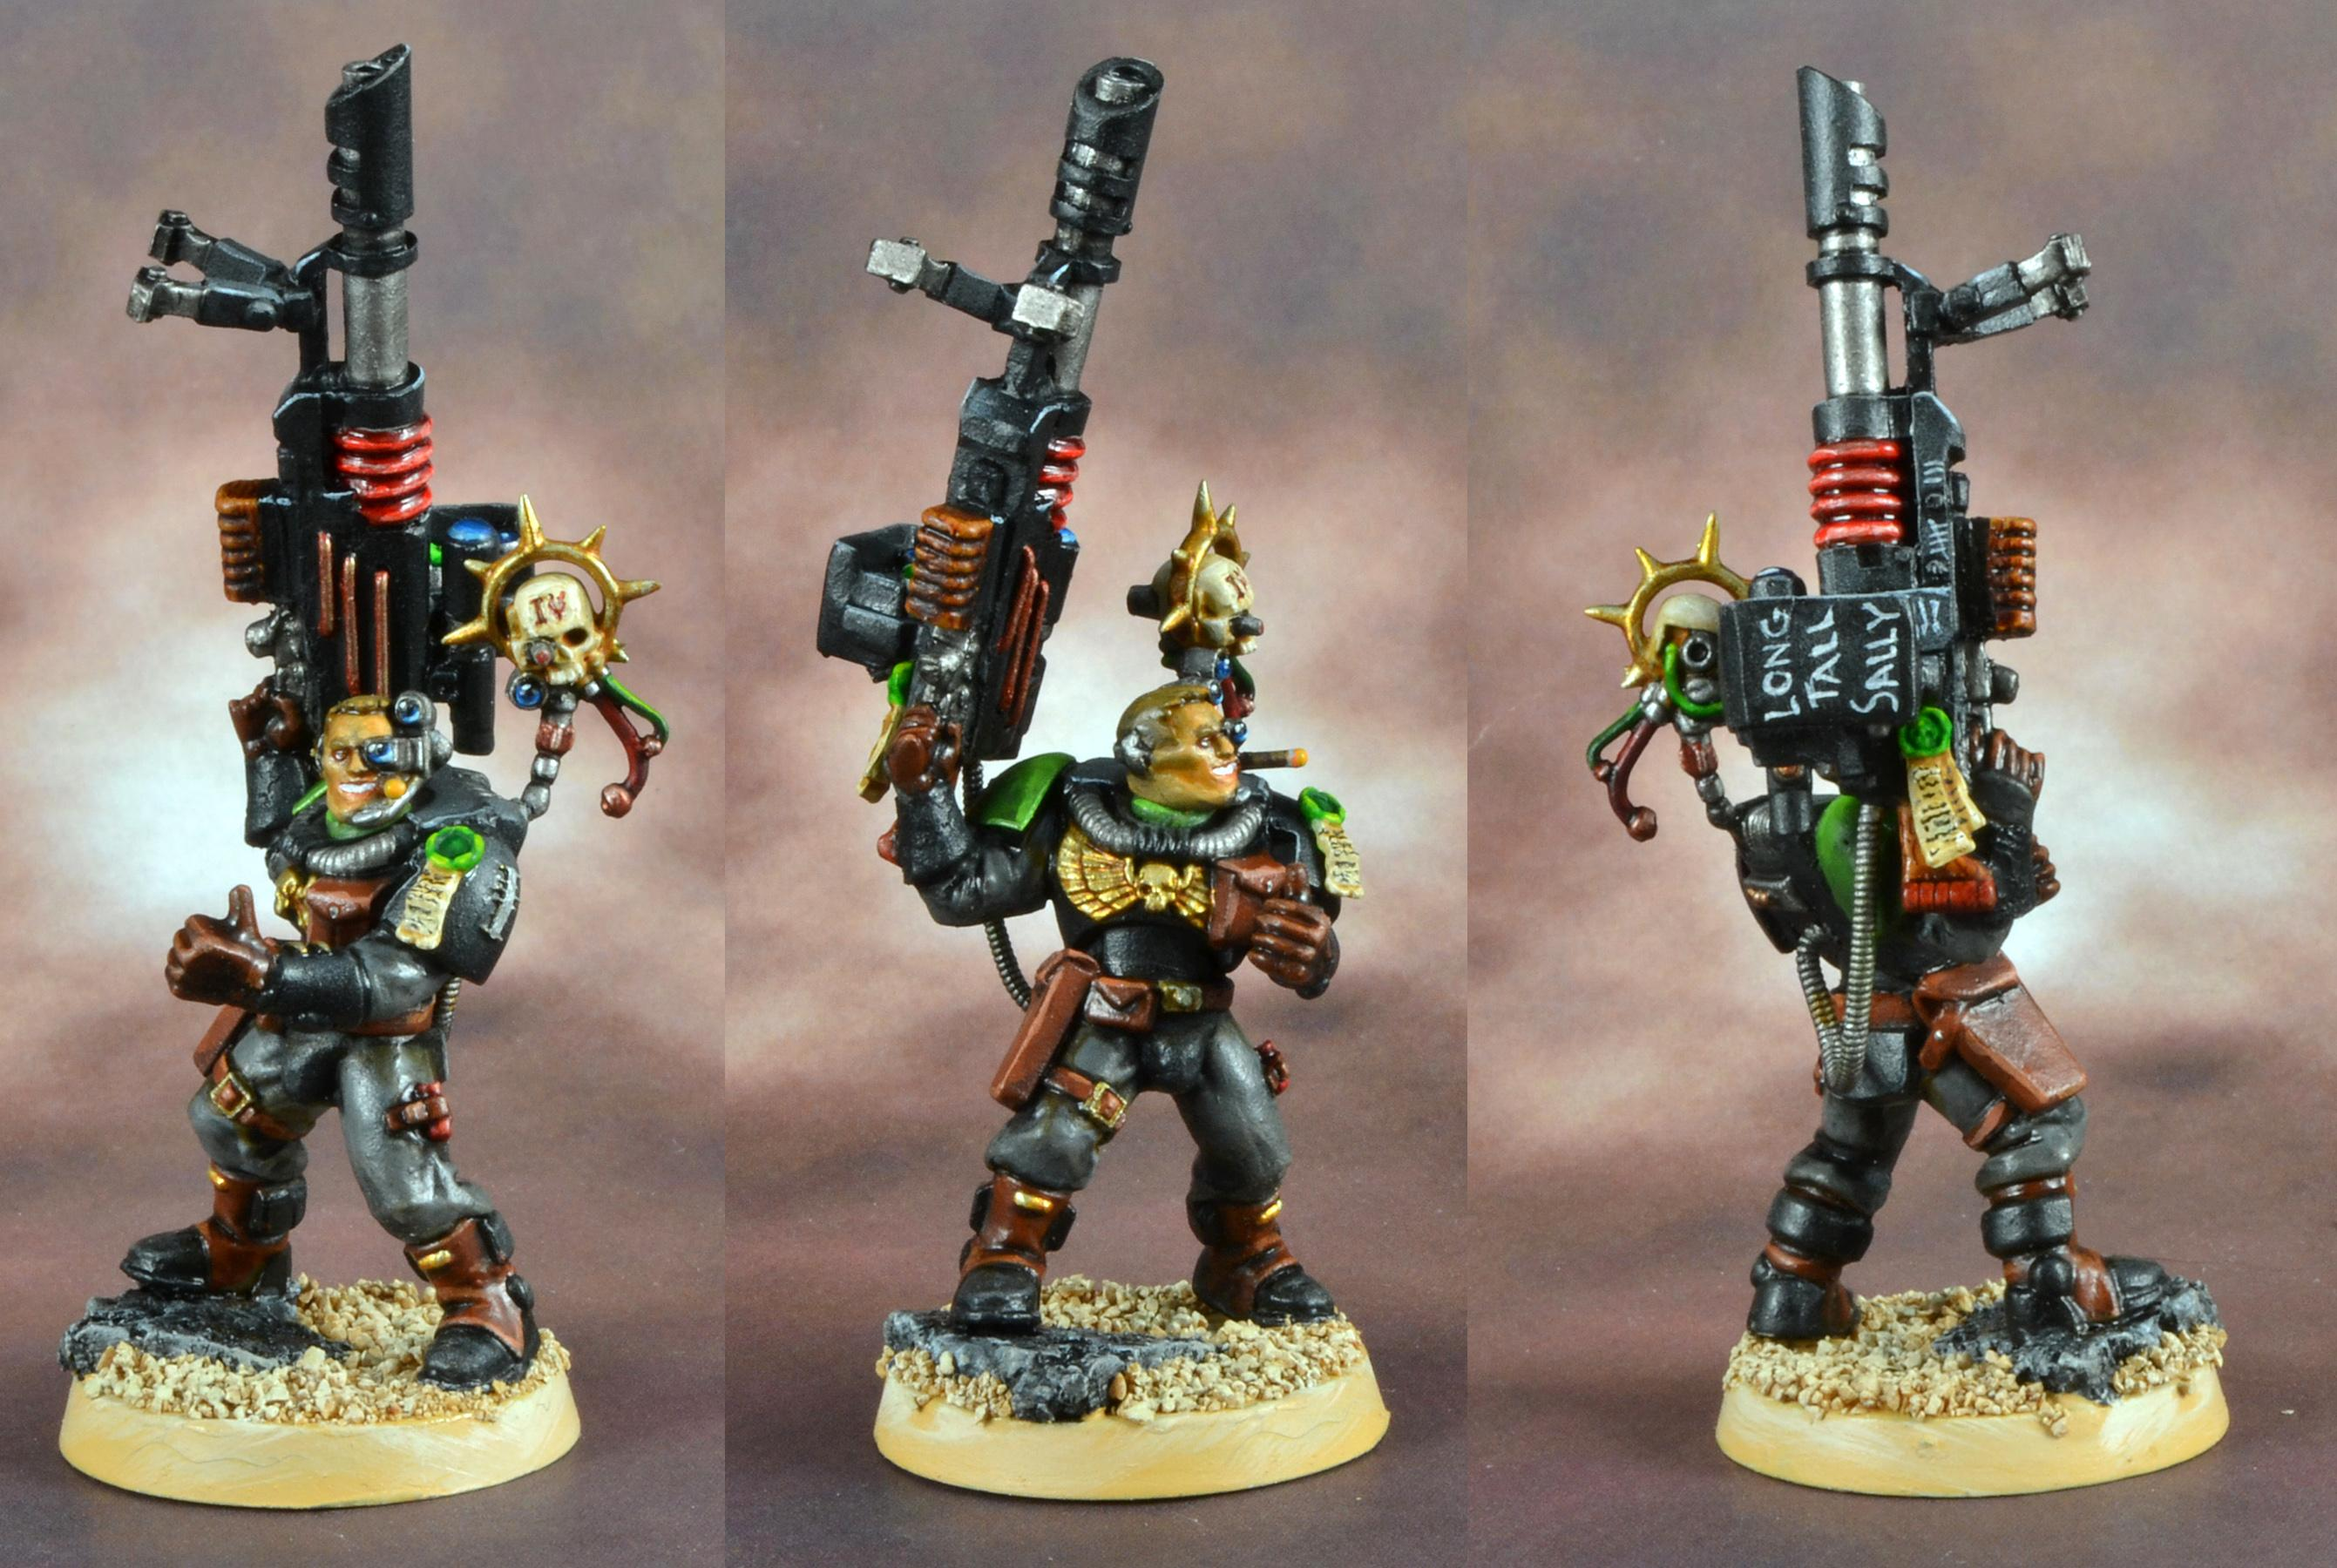 Mantis Warriors, Scouts, Space Marines, Warhammer 40,000